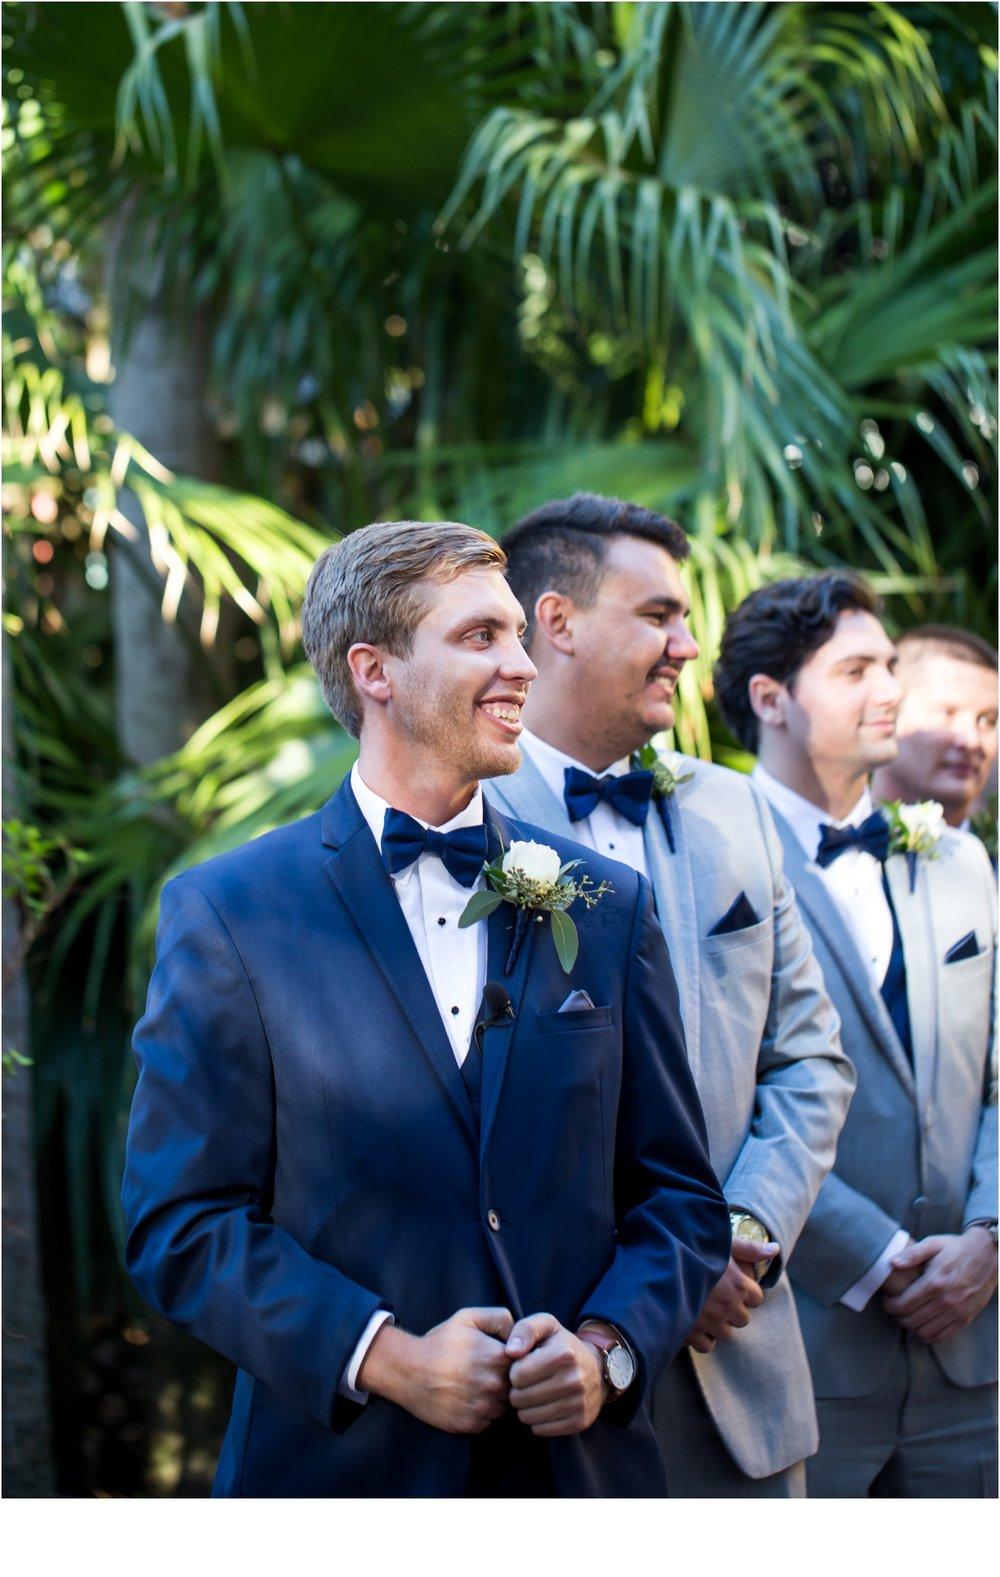 Rainey_Gregg_Photography_St._Simons_Island_Georgia_California_Wedding_Portrait_Photography_0645.jpg